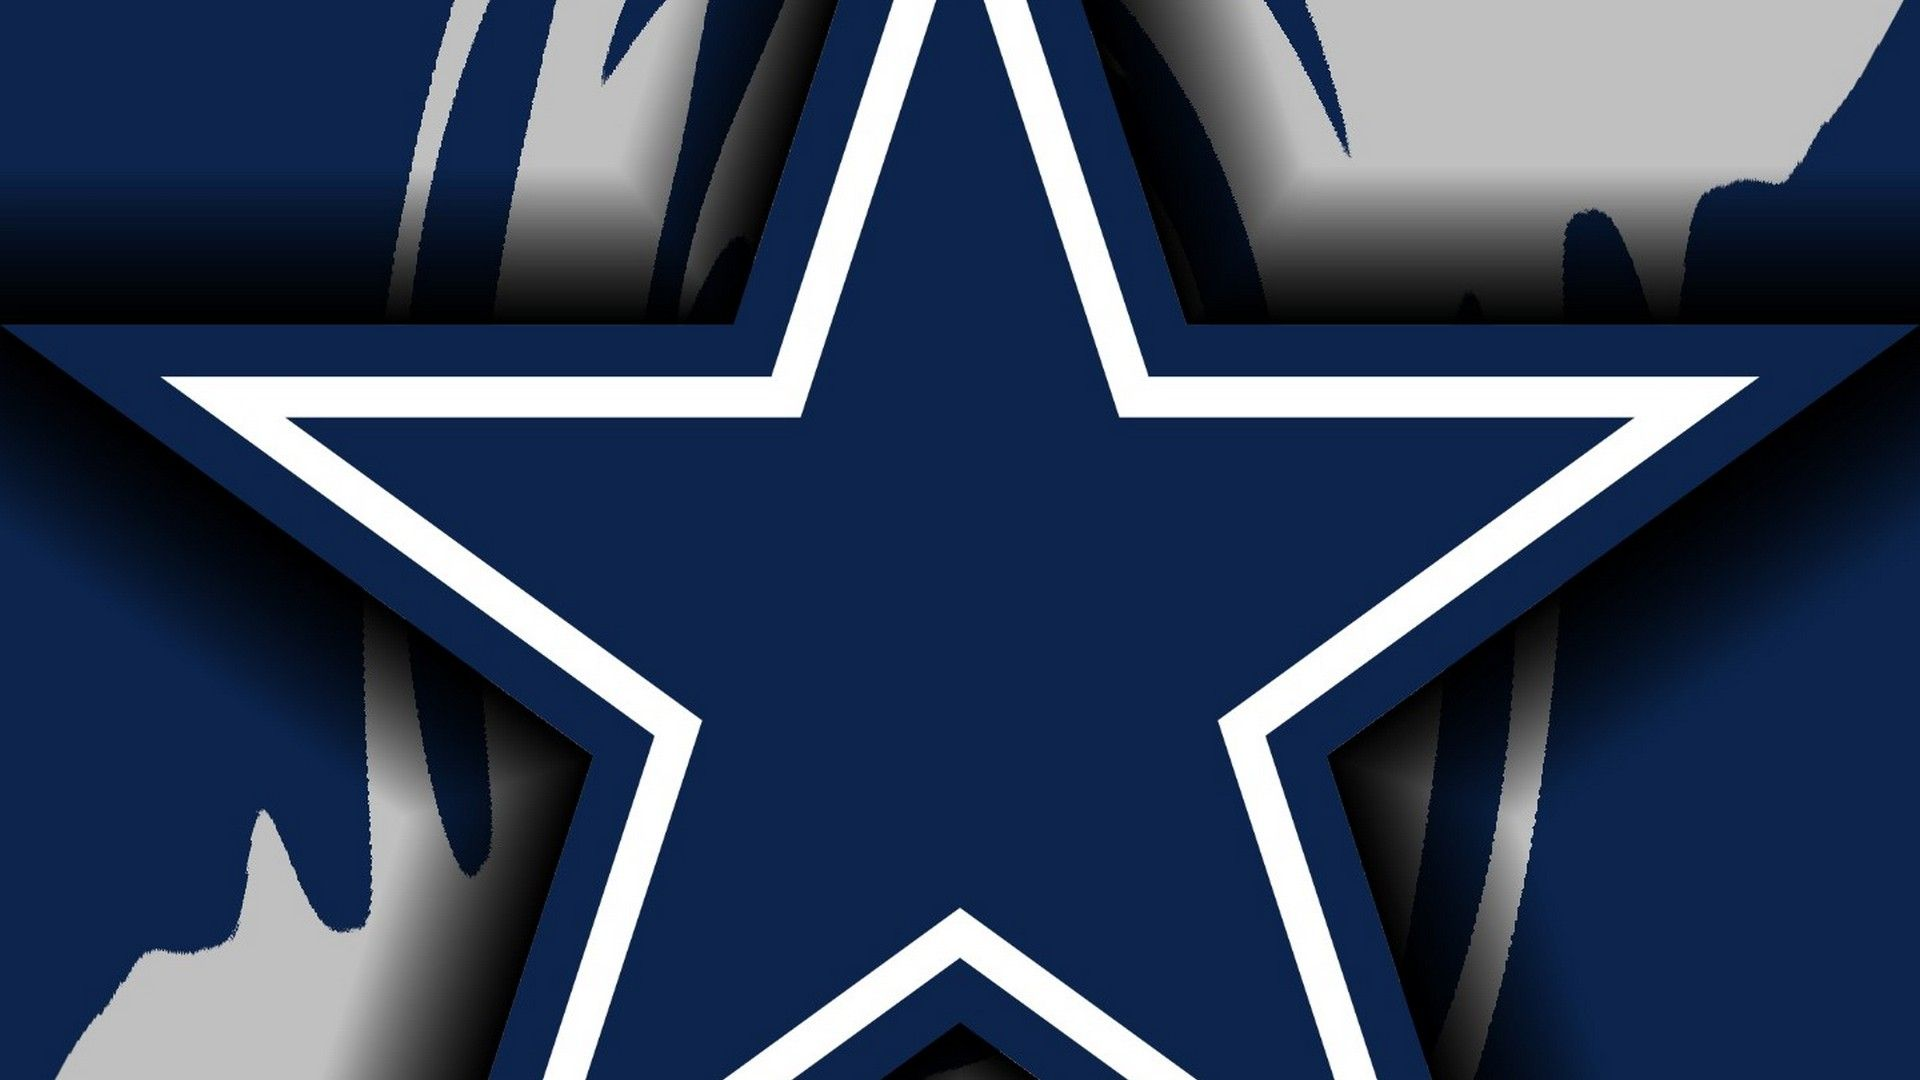 Wallpapers HD Dallas Cowboys 2020 NFL Football Wallpapers Nfl 1920x1080